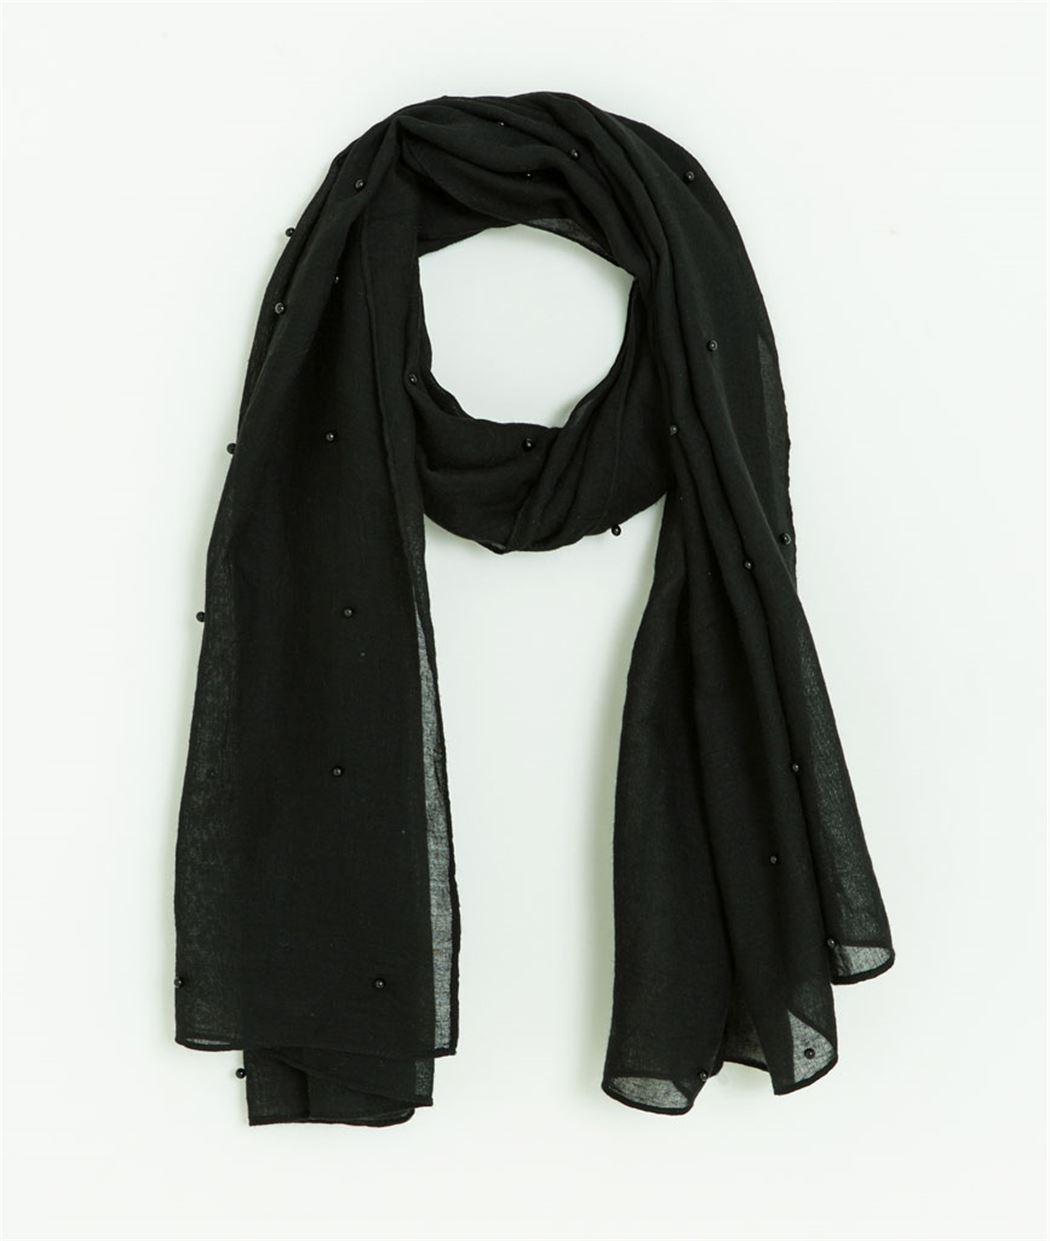 Foulard noir uni avec perles NOIR